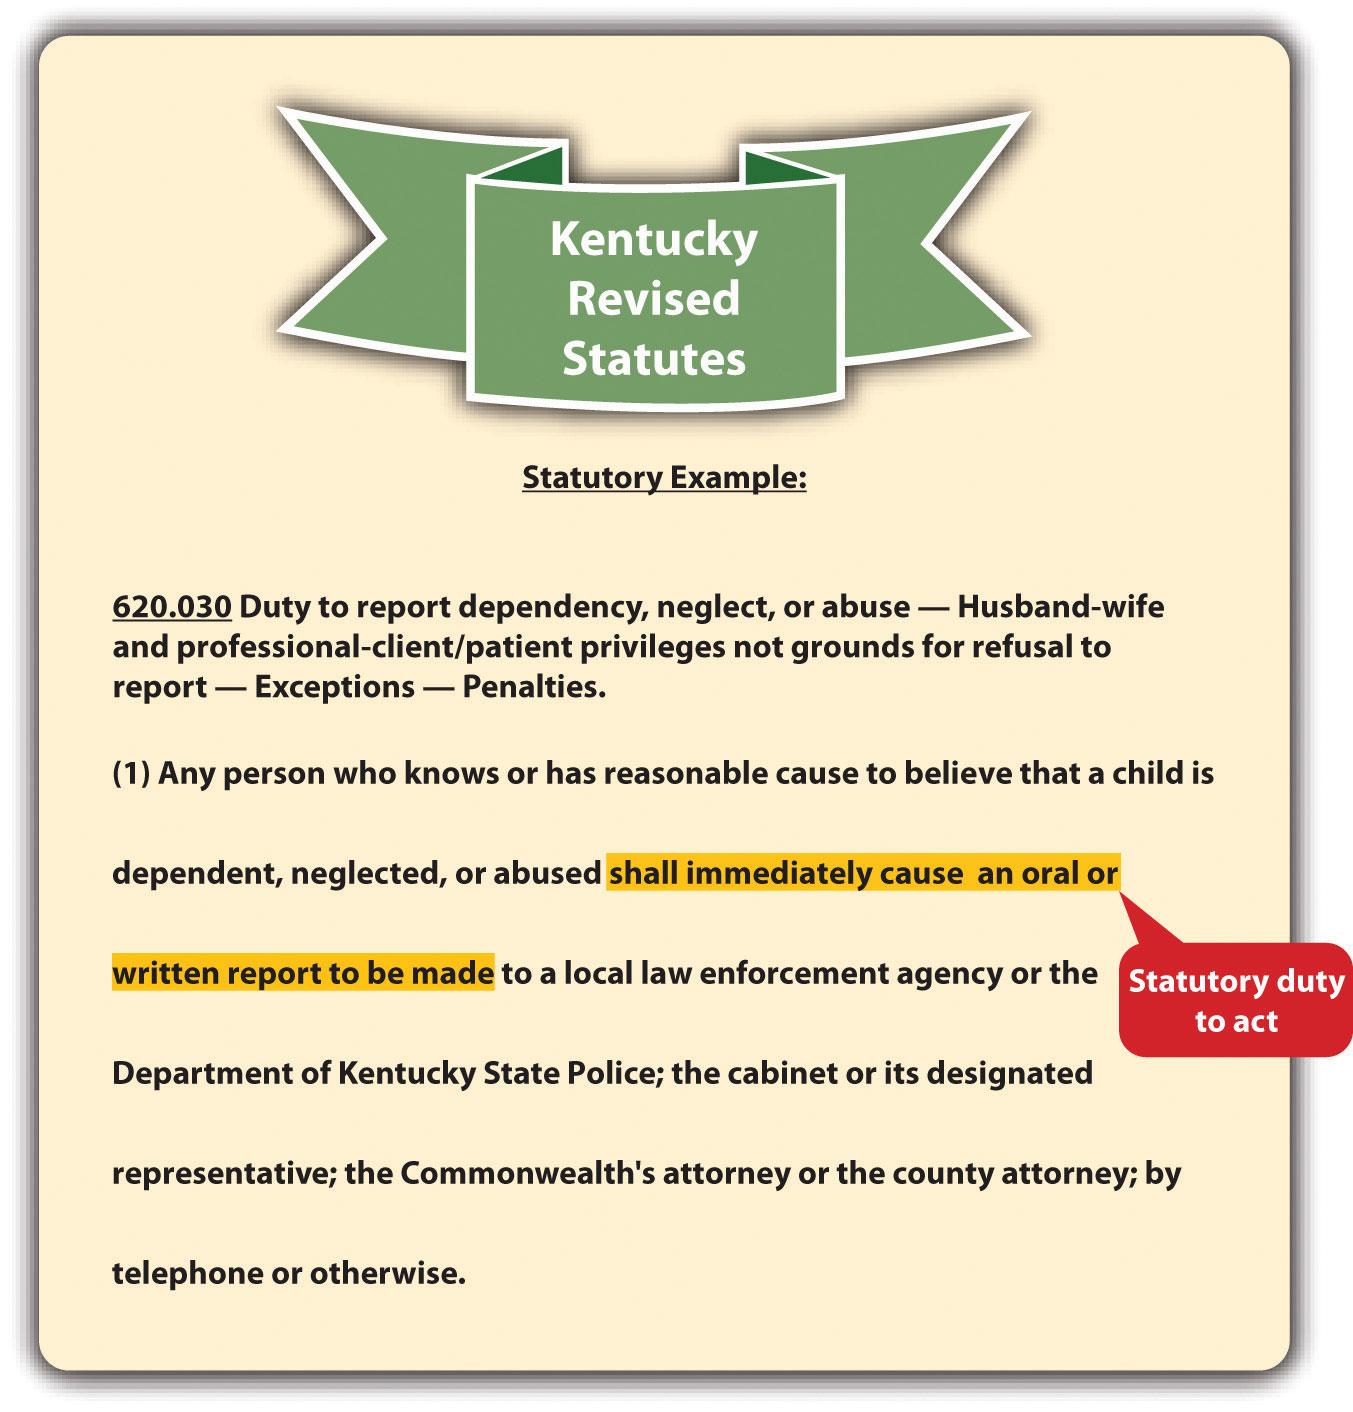 Kentucky Revised Statutes